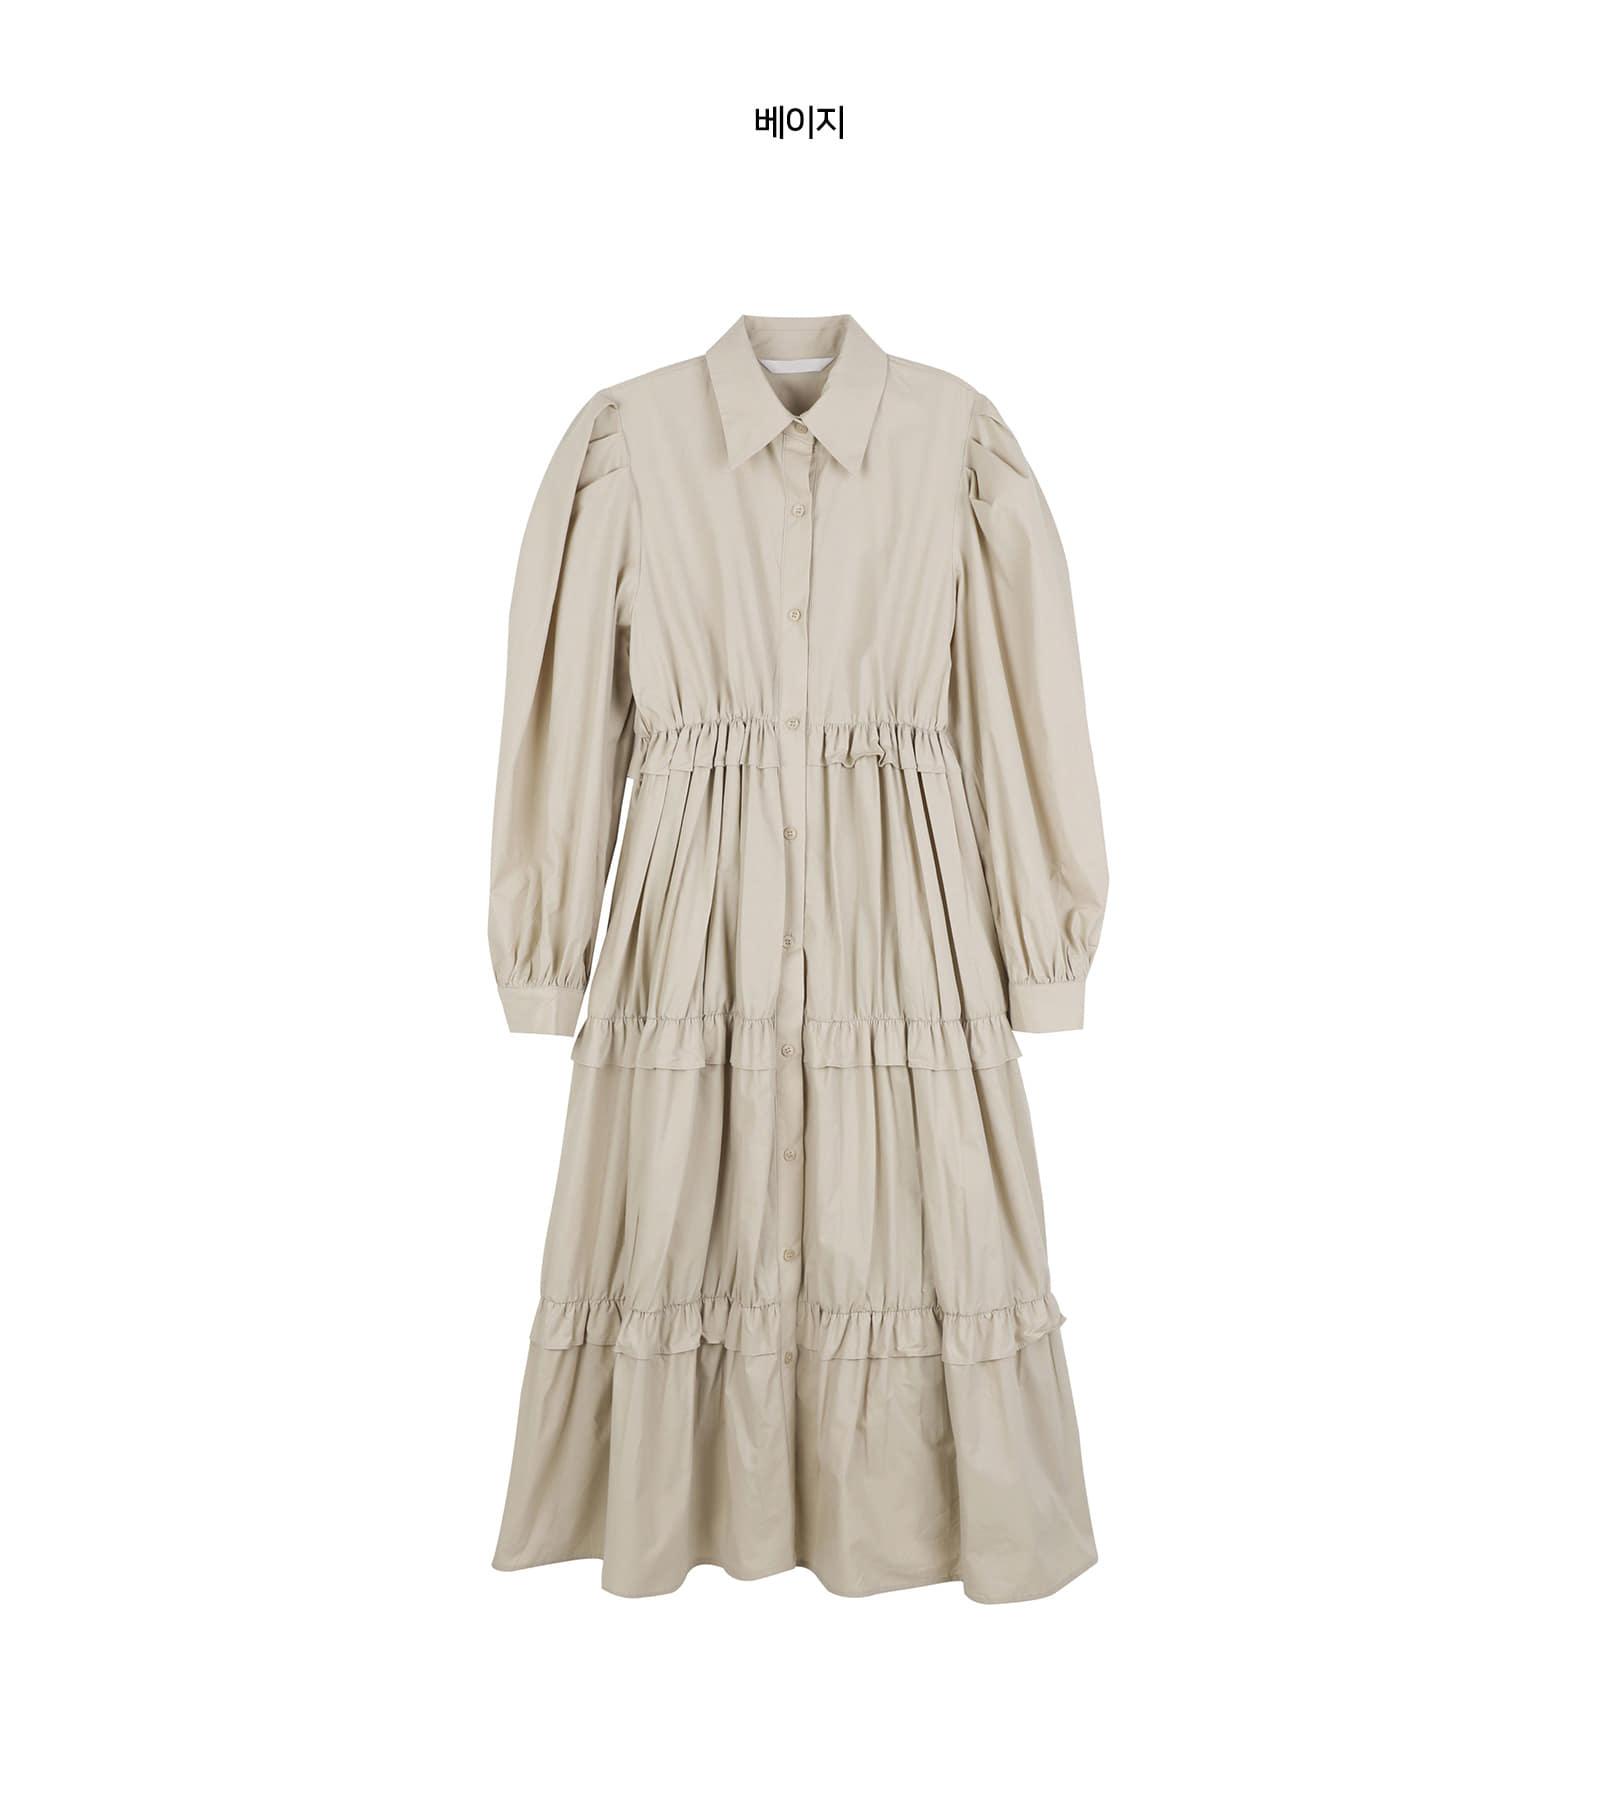 Alice frill puff maxi dress